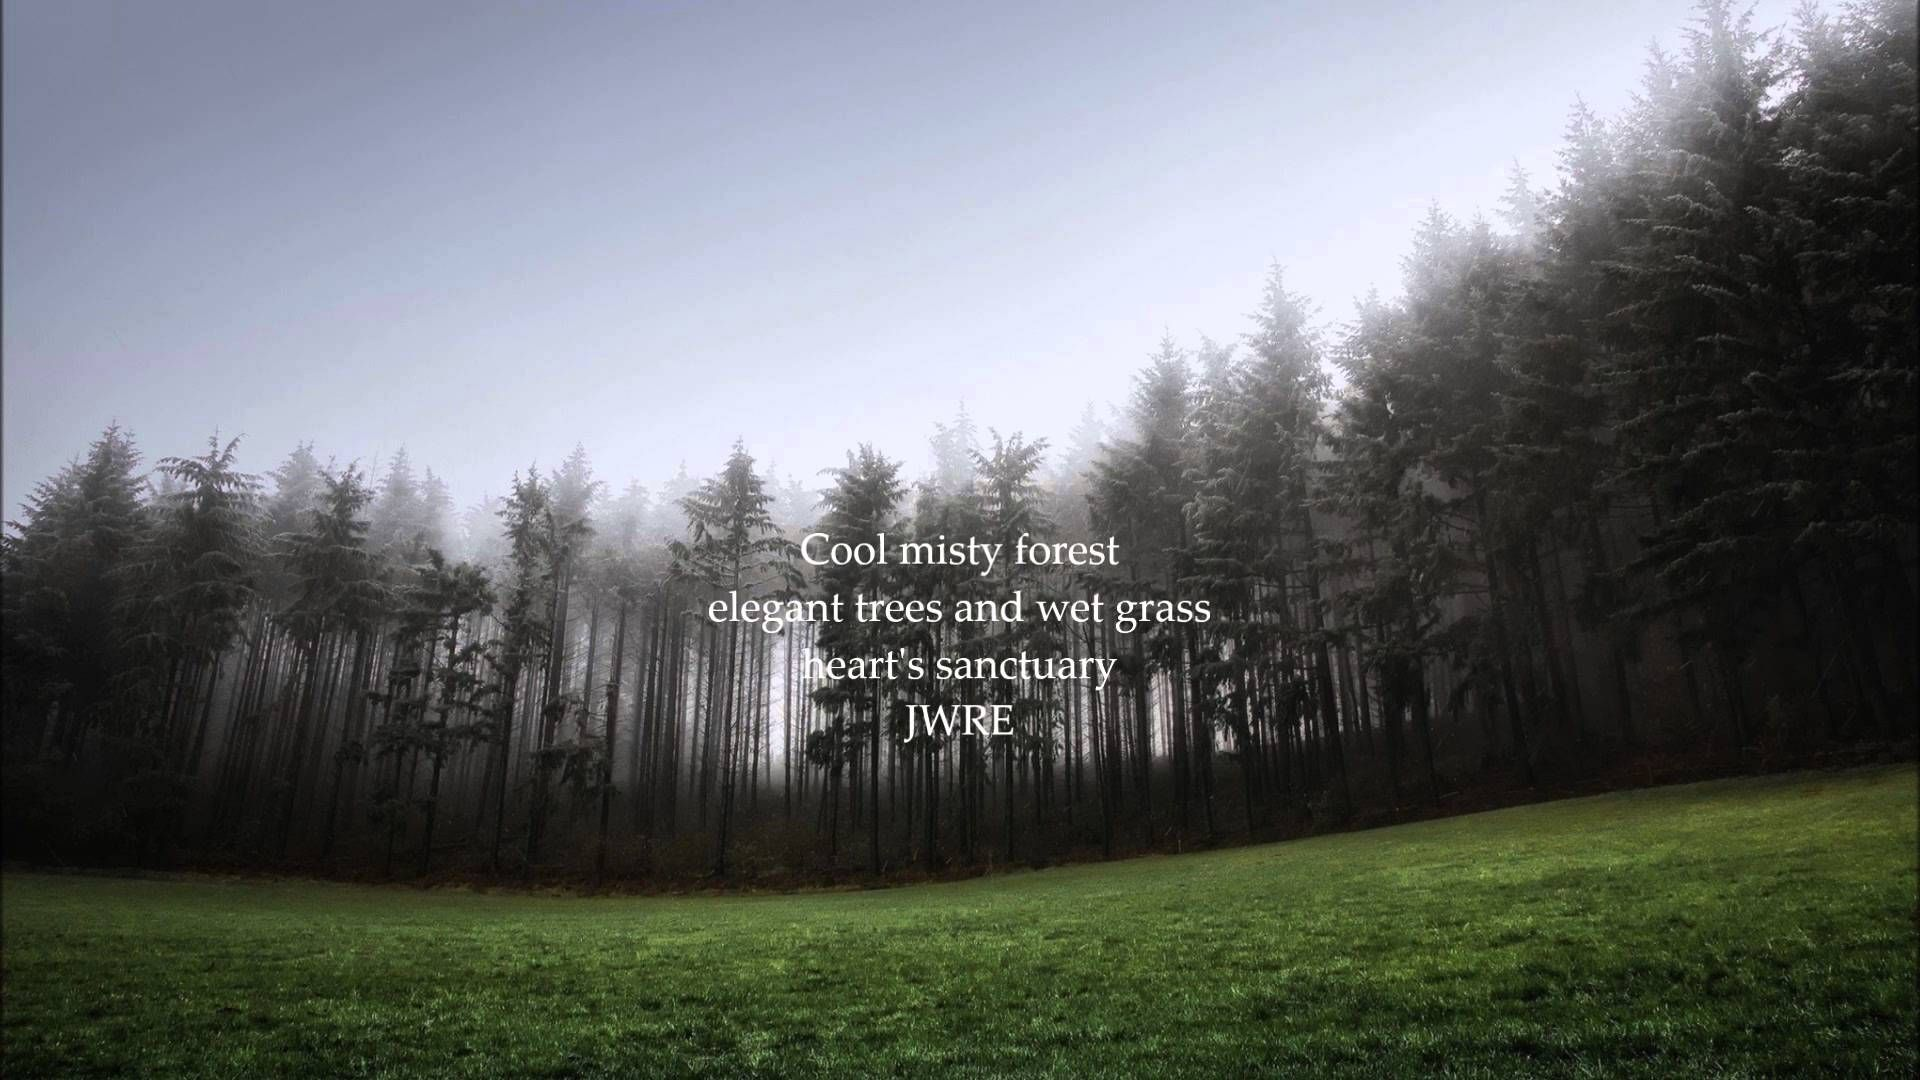 Cool misty forest JWR Emmett, fantasy poetry Desktop